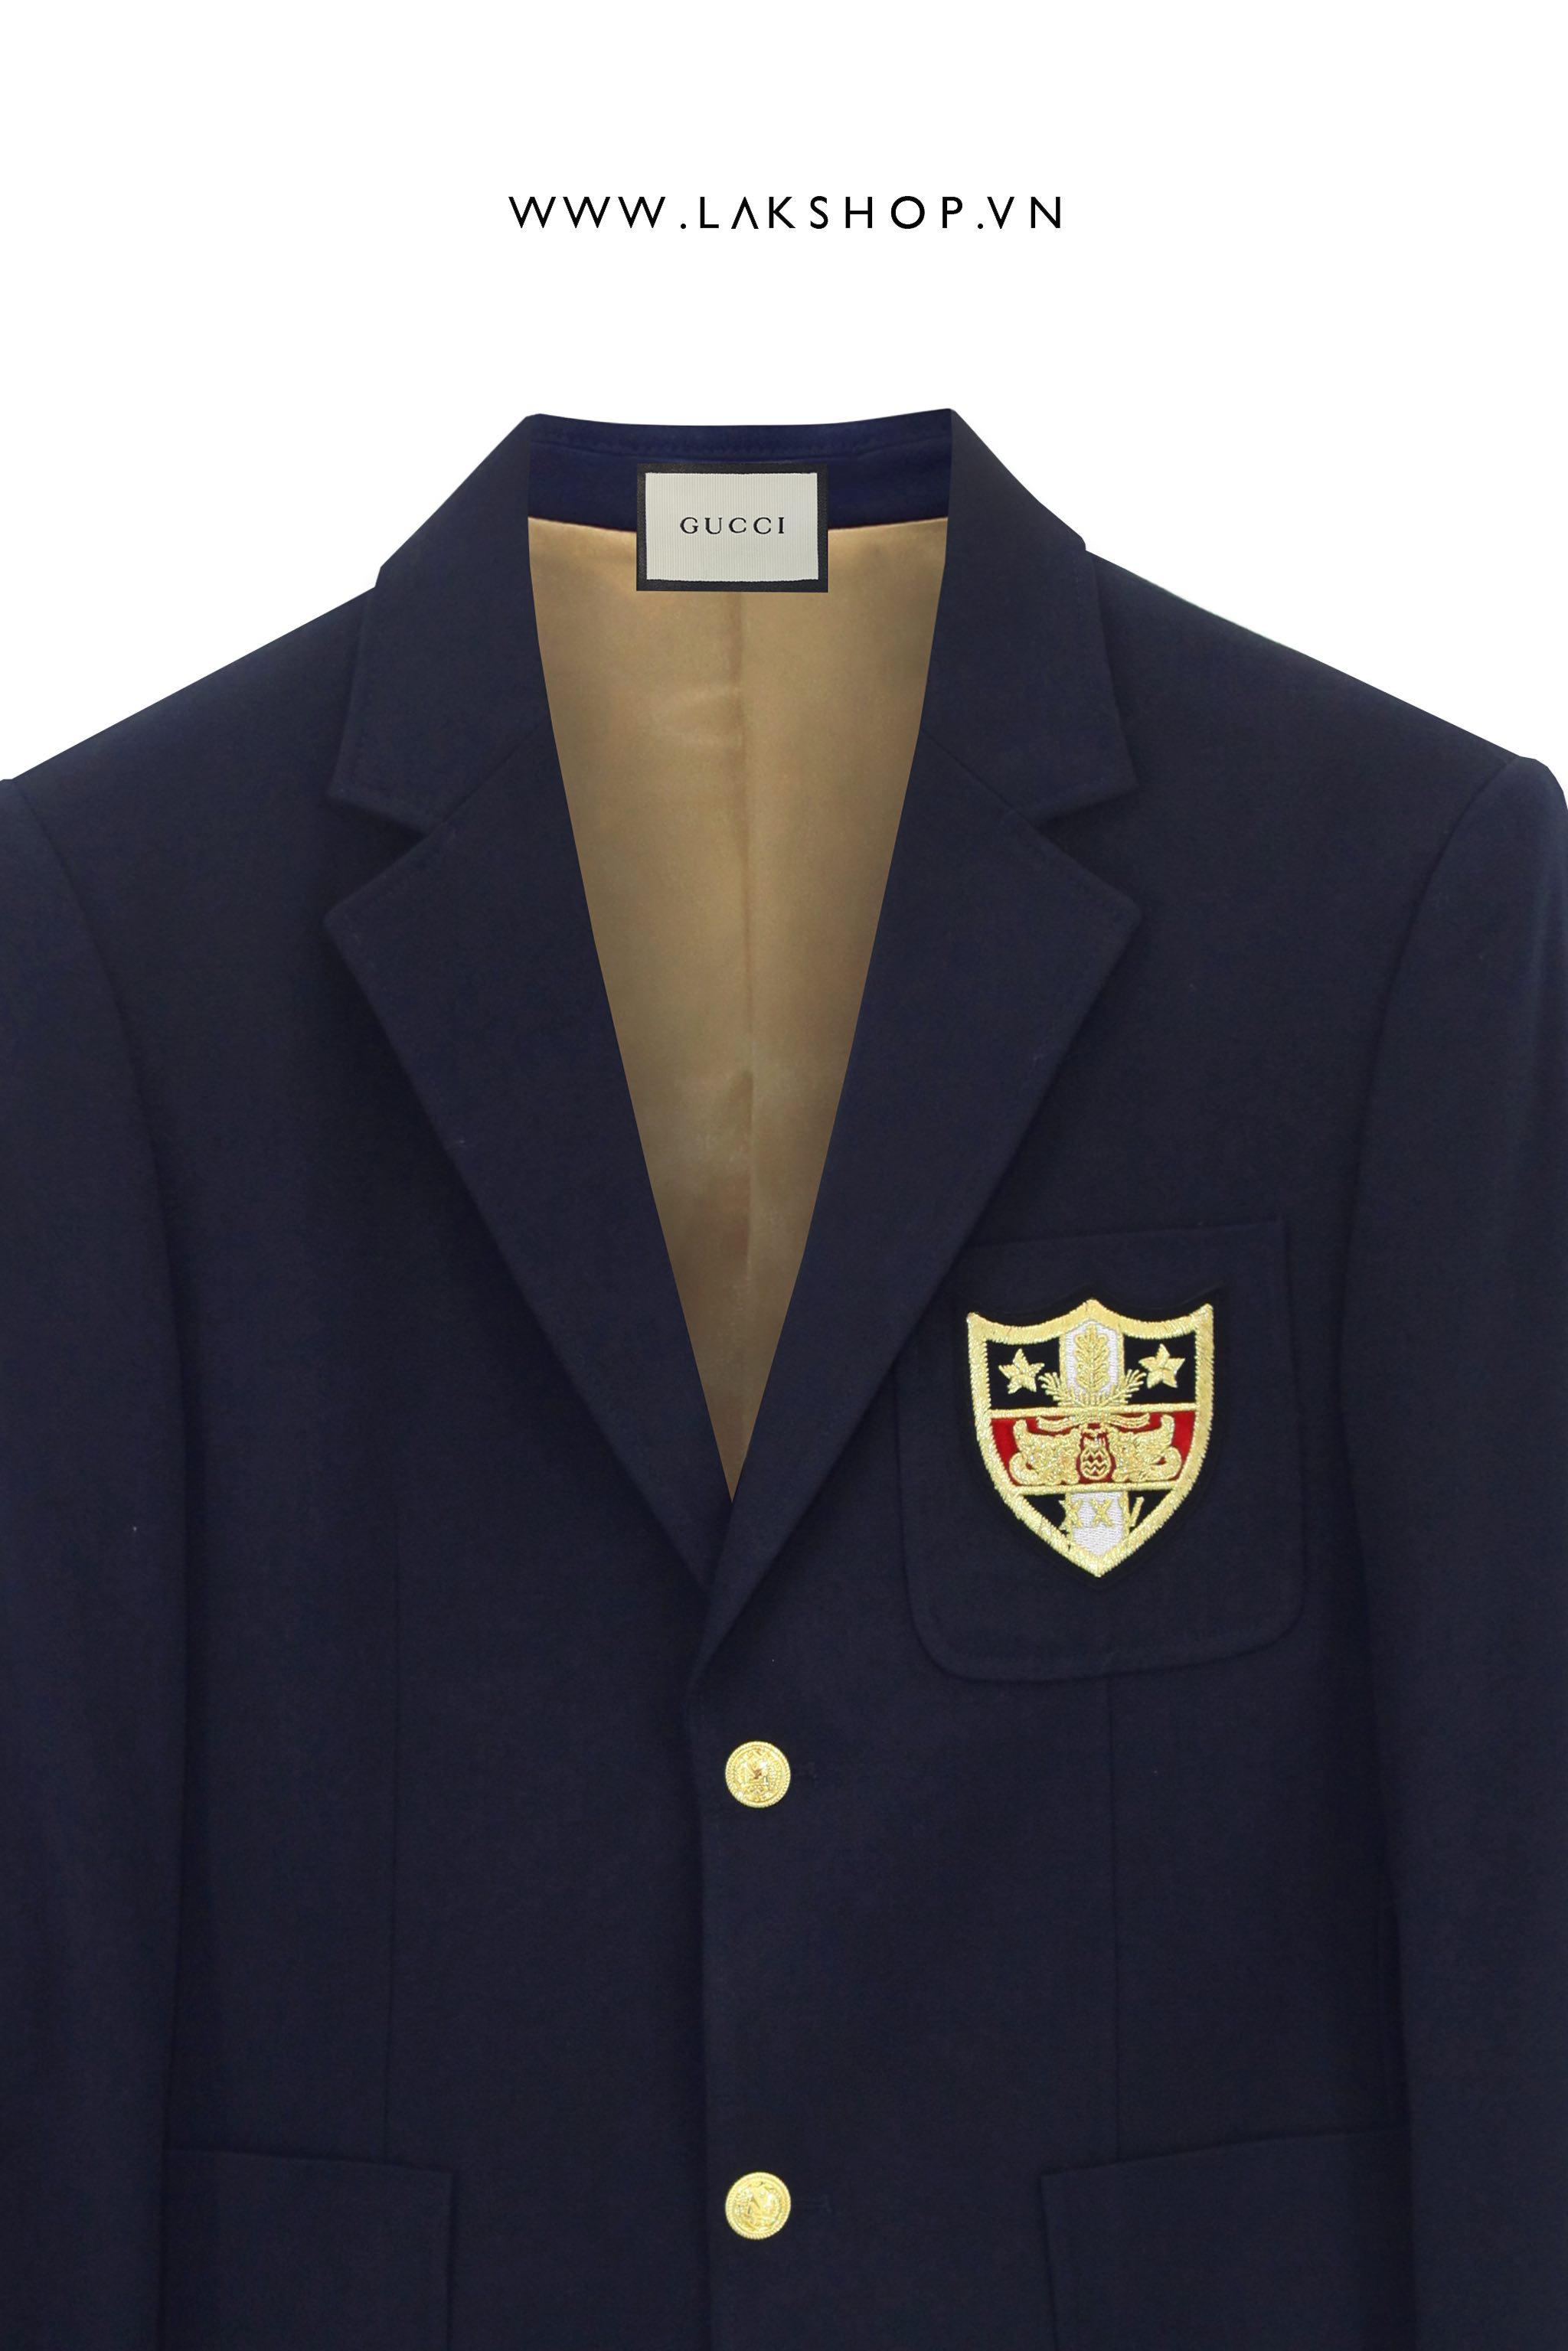 Louis Vuitton Striped Monogram Workwear Denim Shirt Jacket